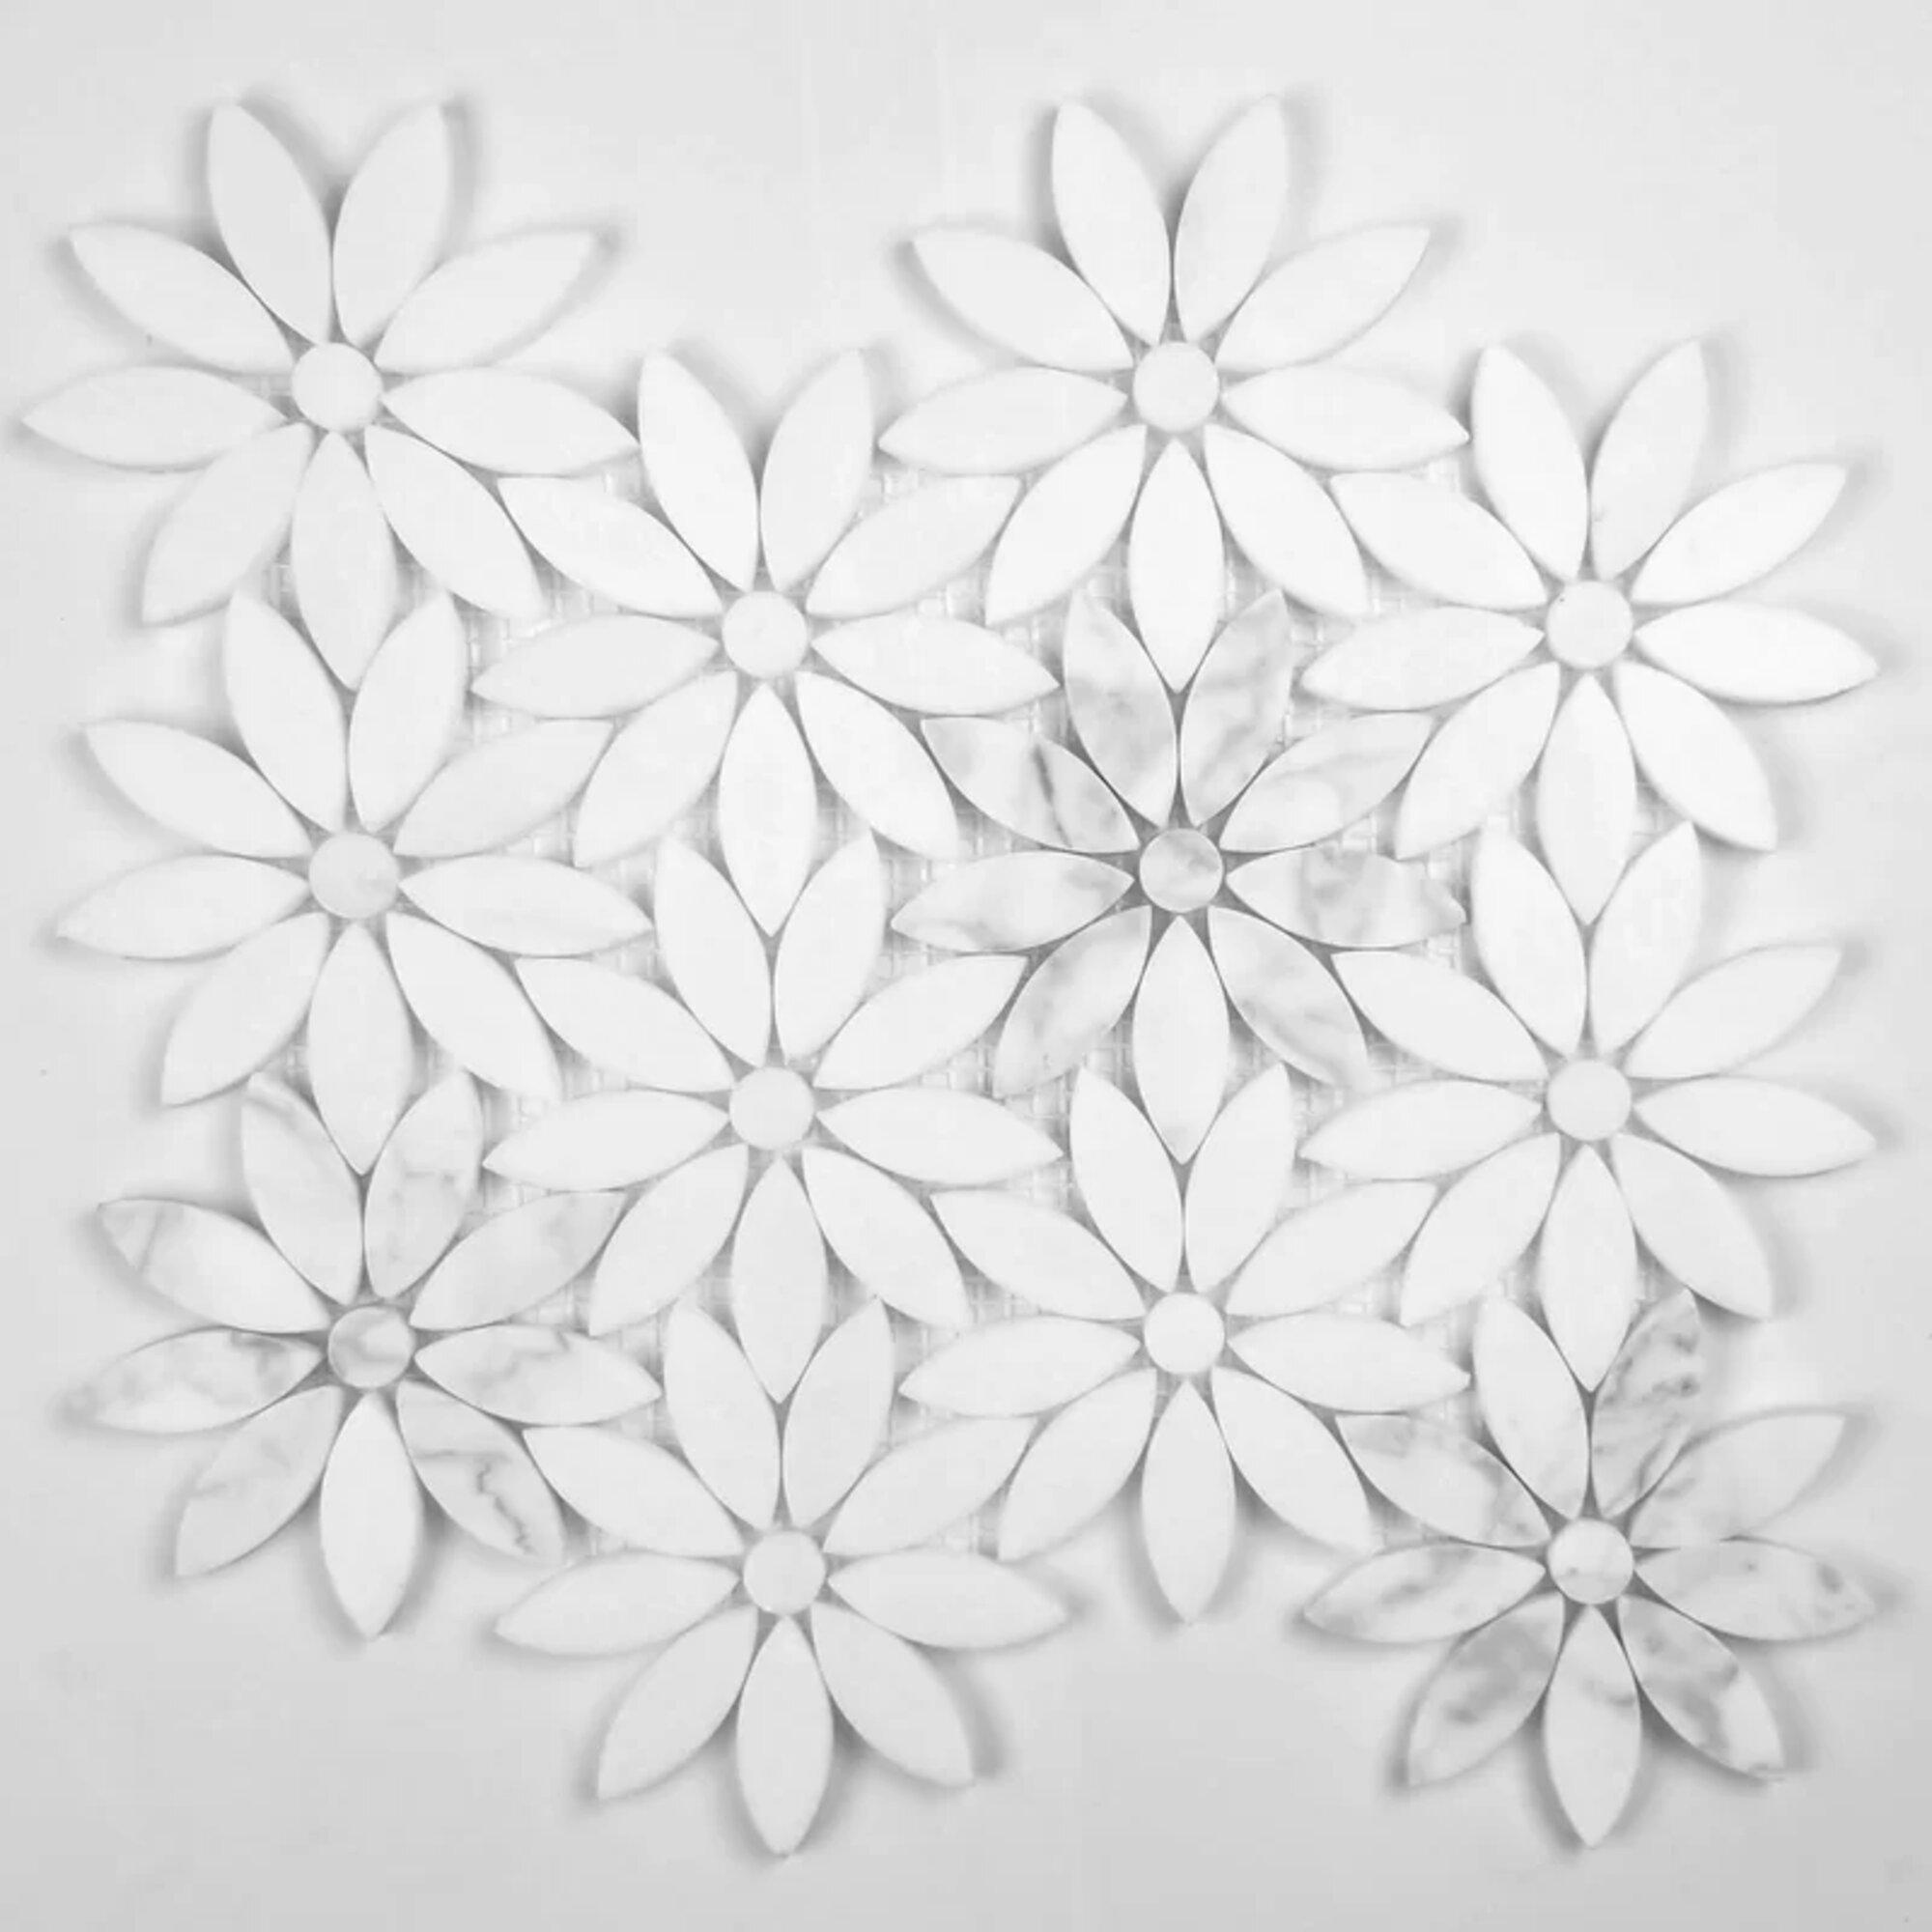 Porpora Carrera Daisy Flower 12 X 12 Natural Stone Mosaic Sheet Tile Wayfair